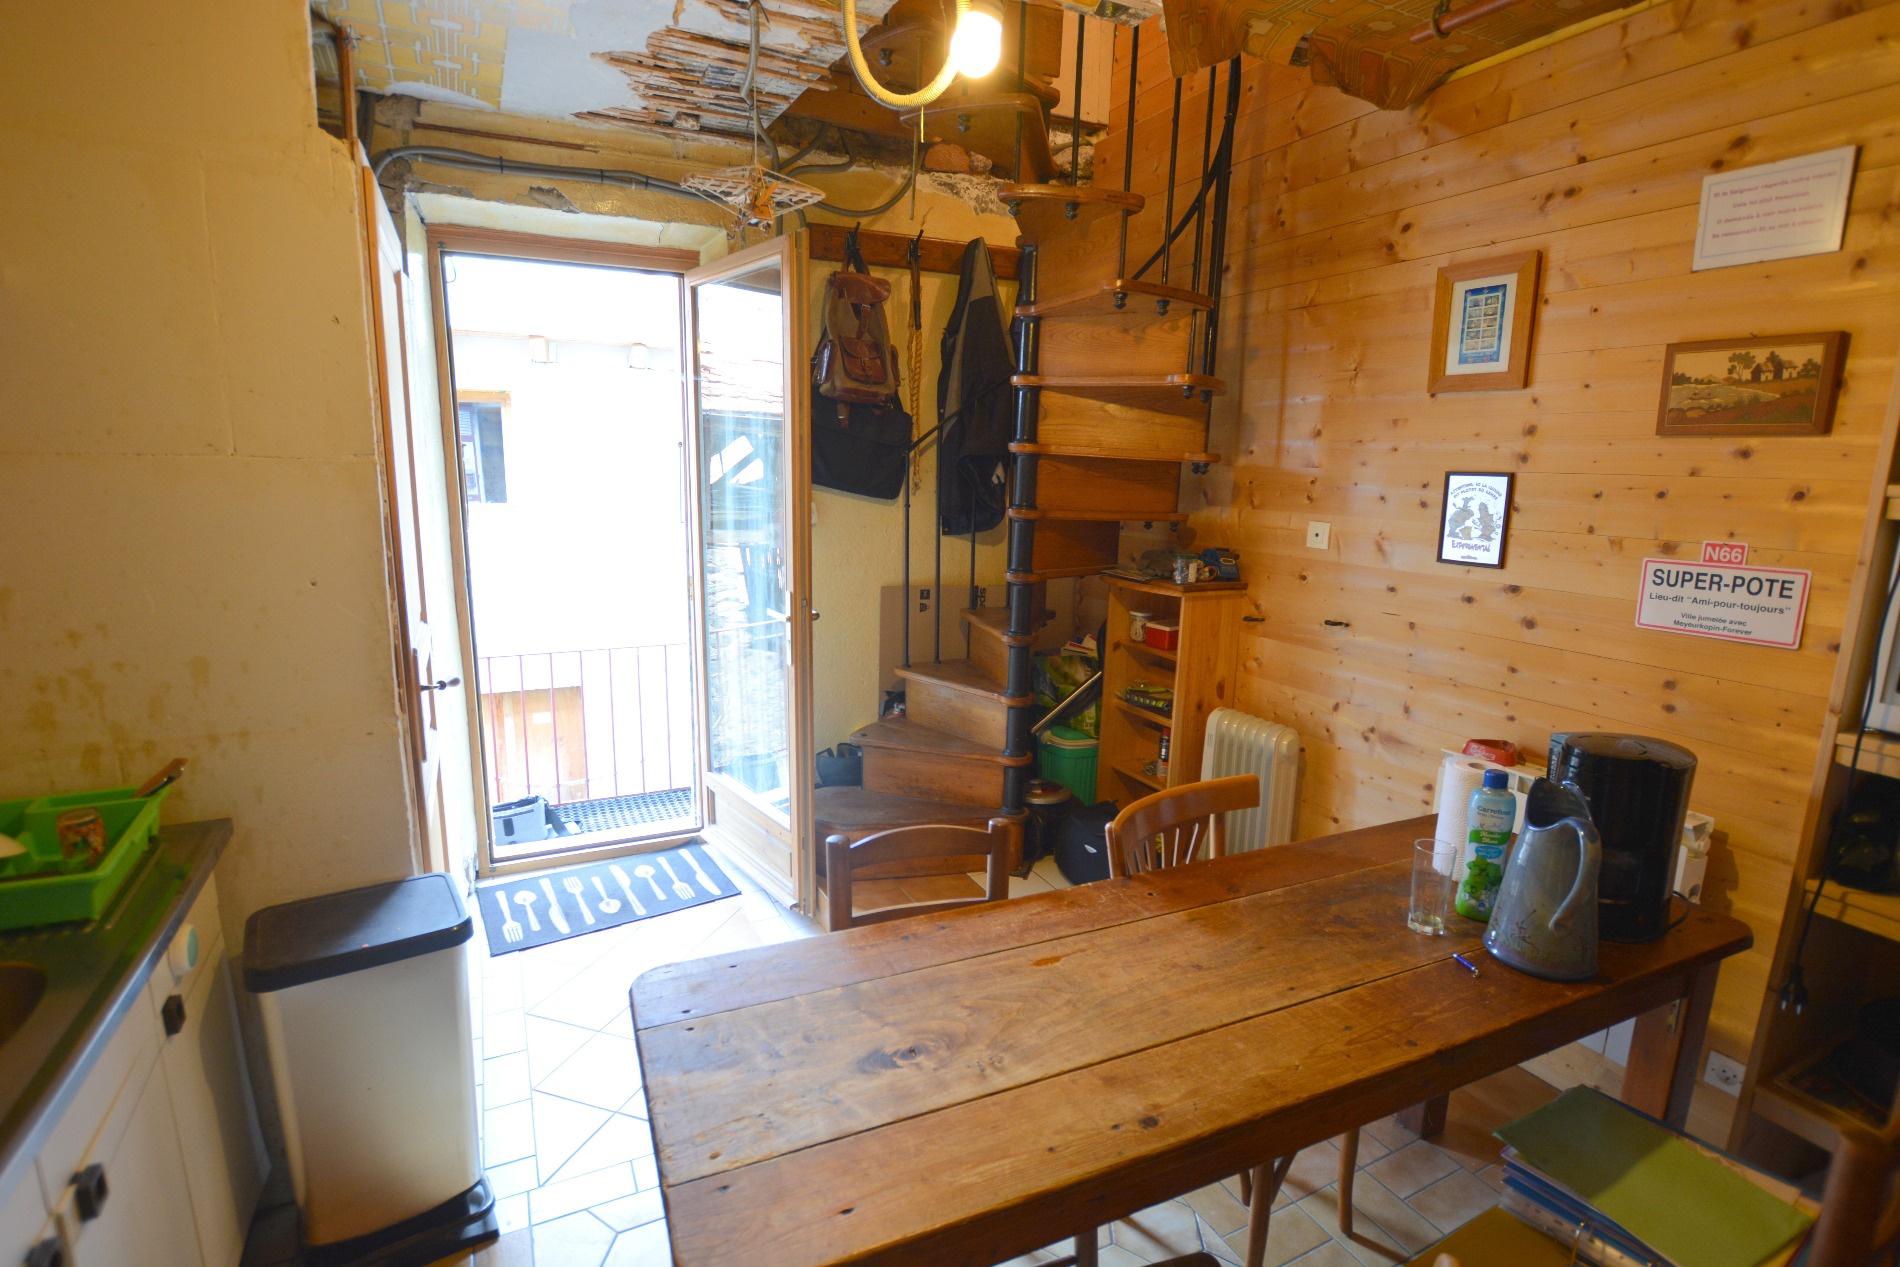 Renovation maison village perfect renovation in chamoson for Prix renovation complete maison